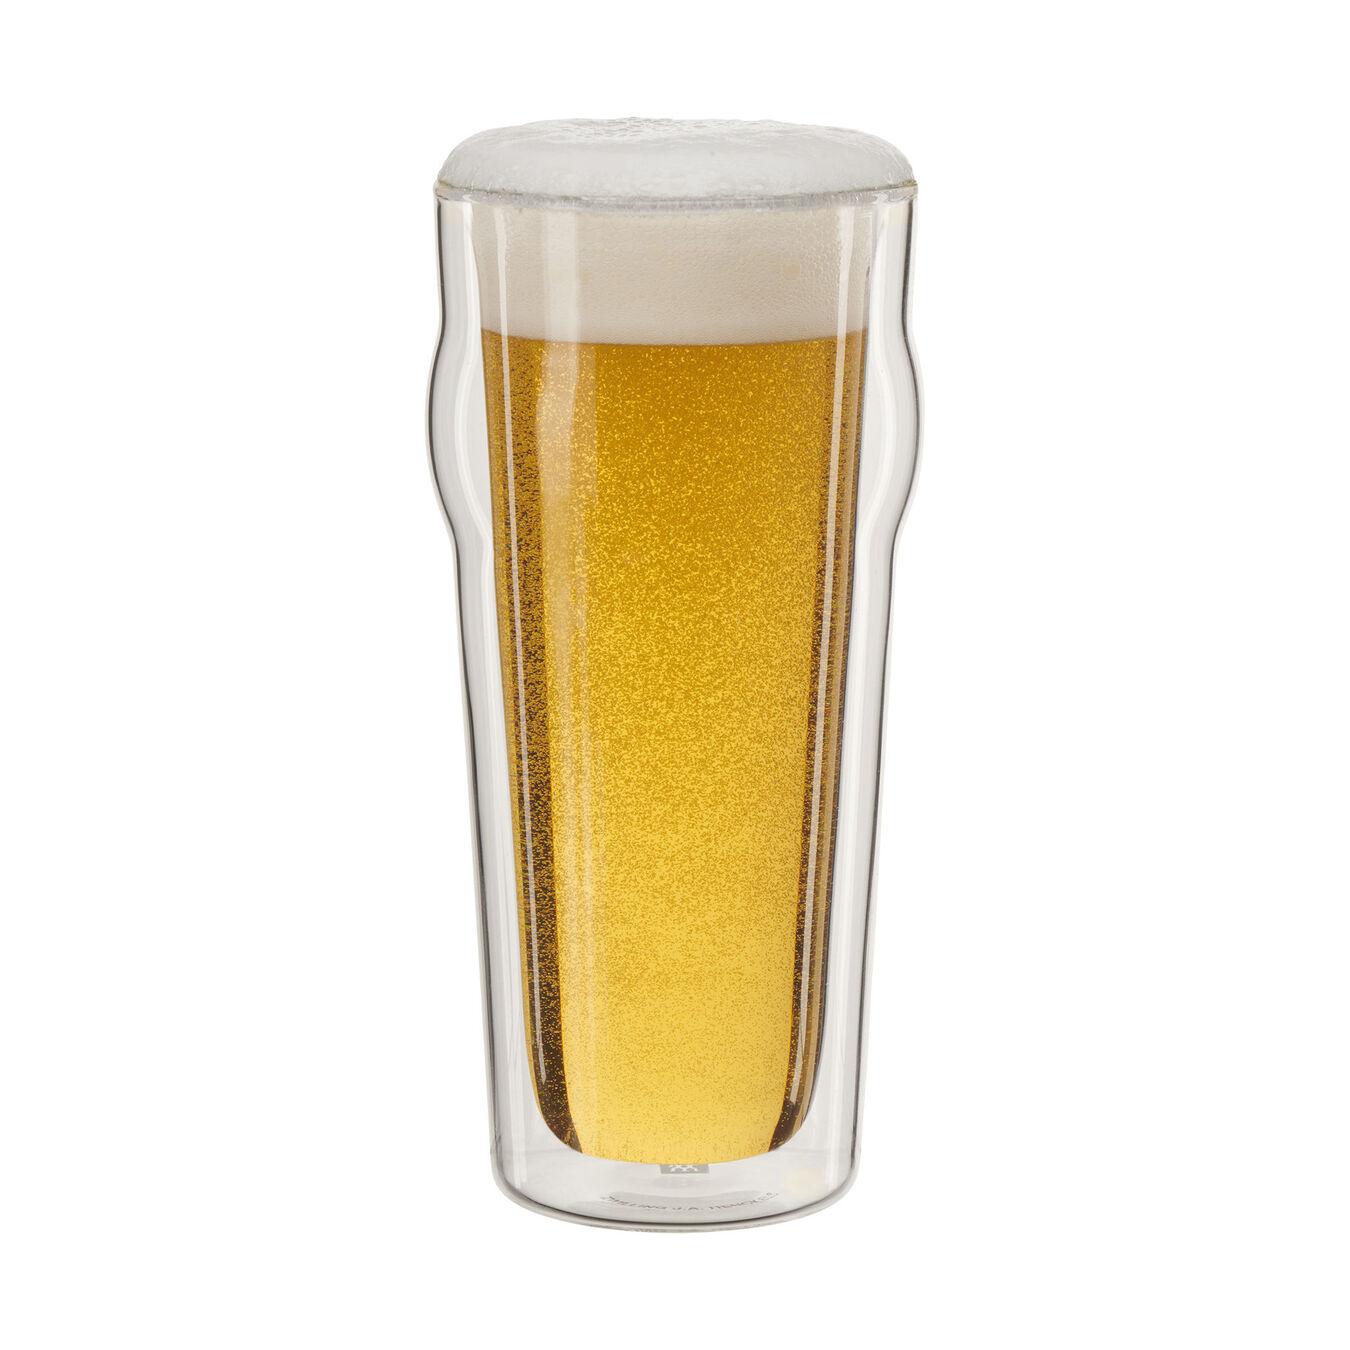 4 Piece Beer glass set,,large 2